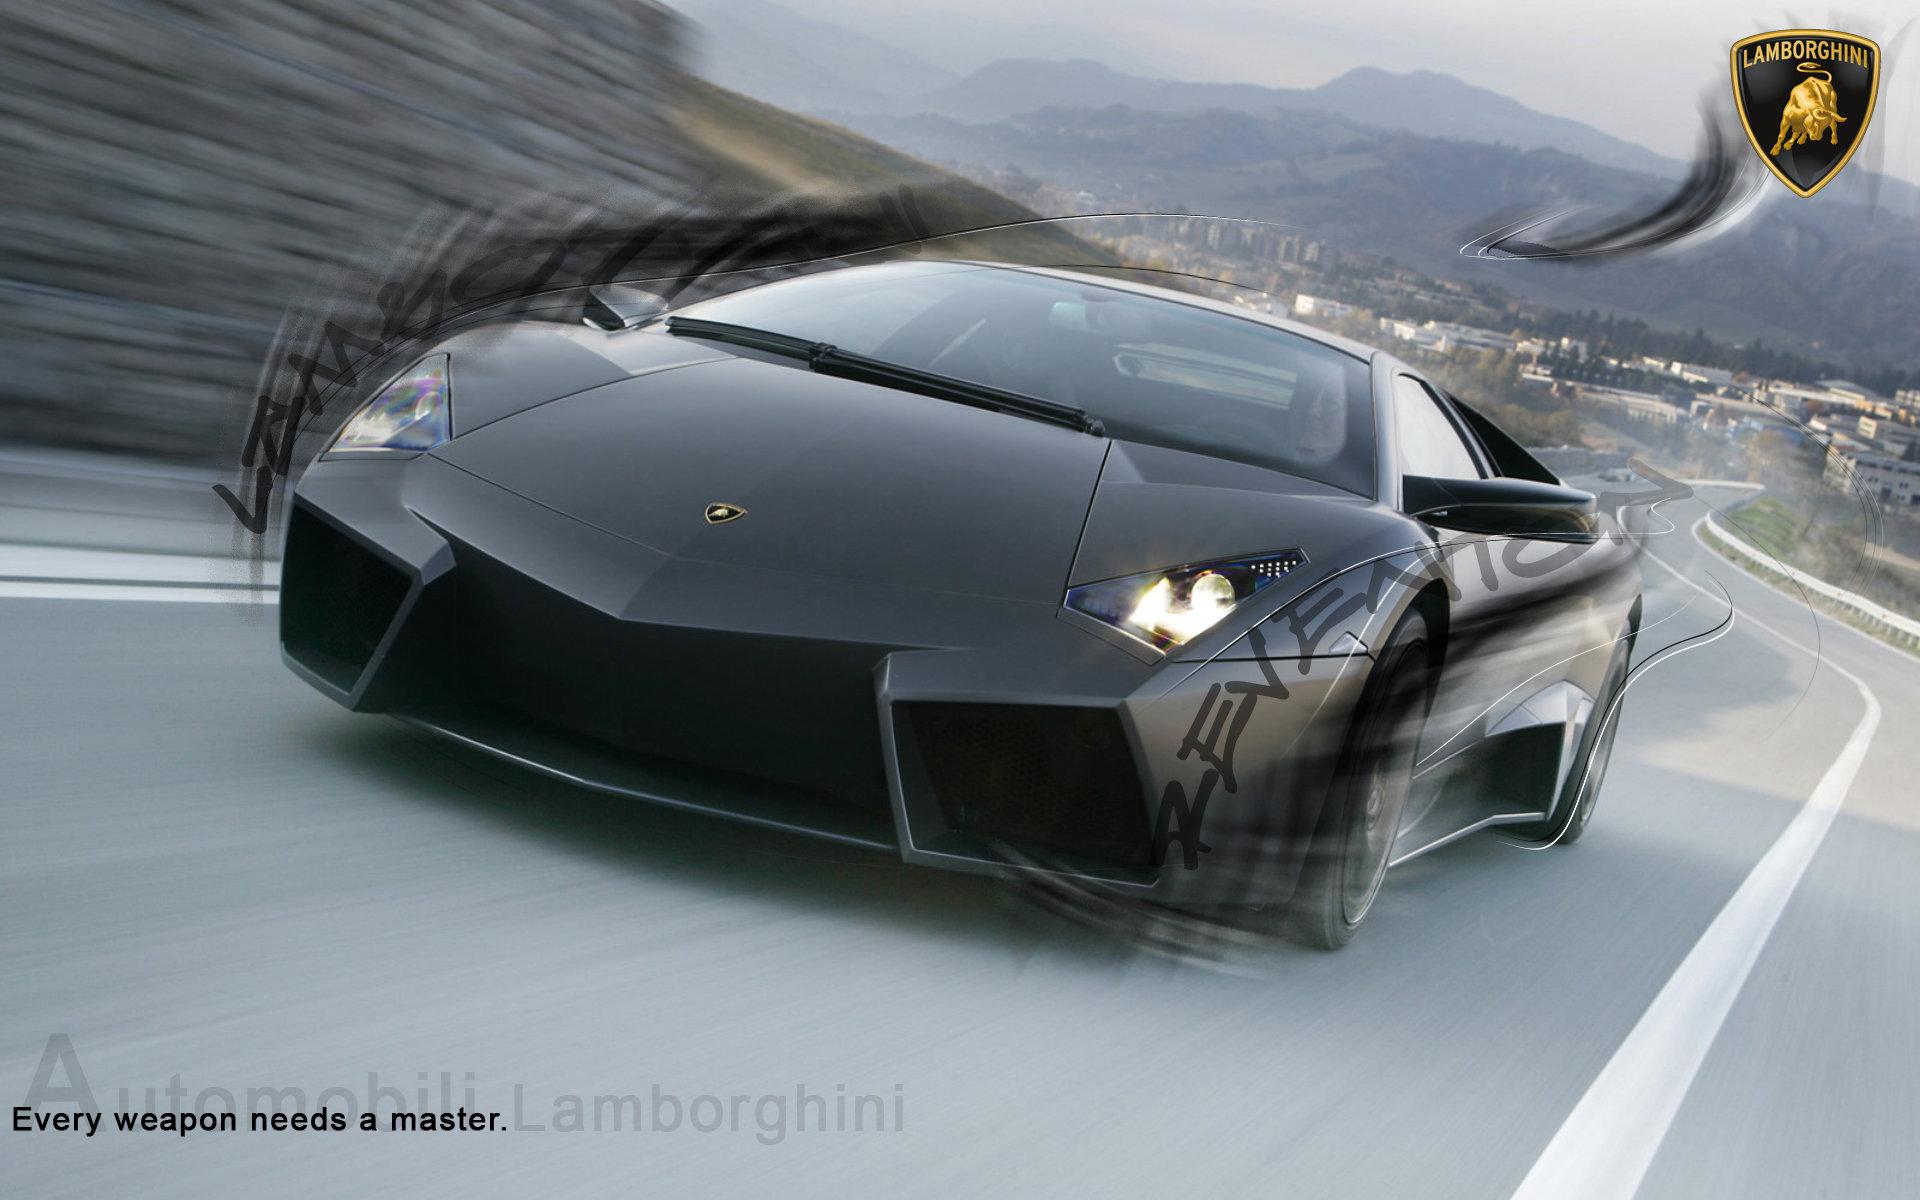 Download Hd 1920x1200 Lamborghini Reventon Desktop Background ID397401 For Free